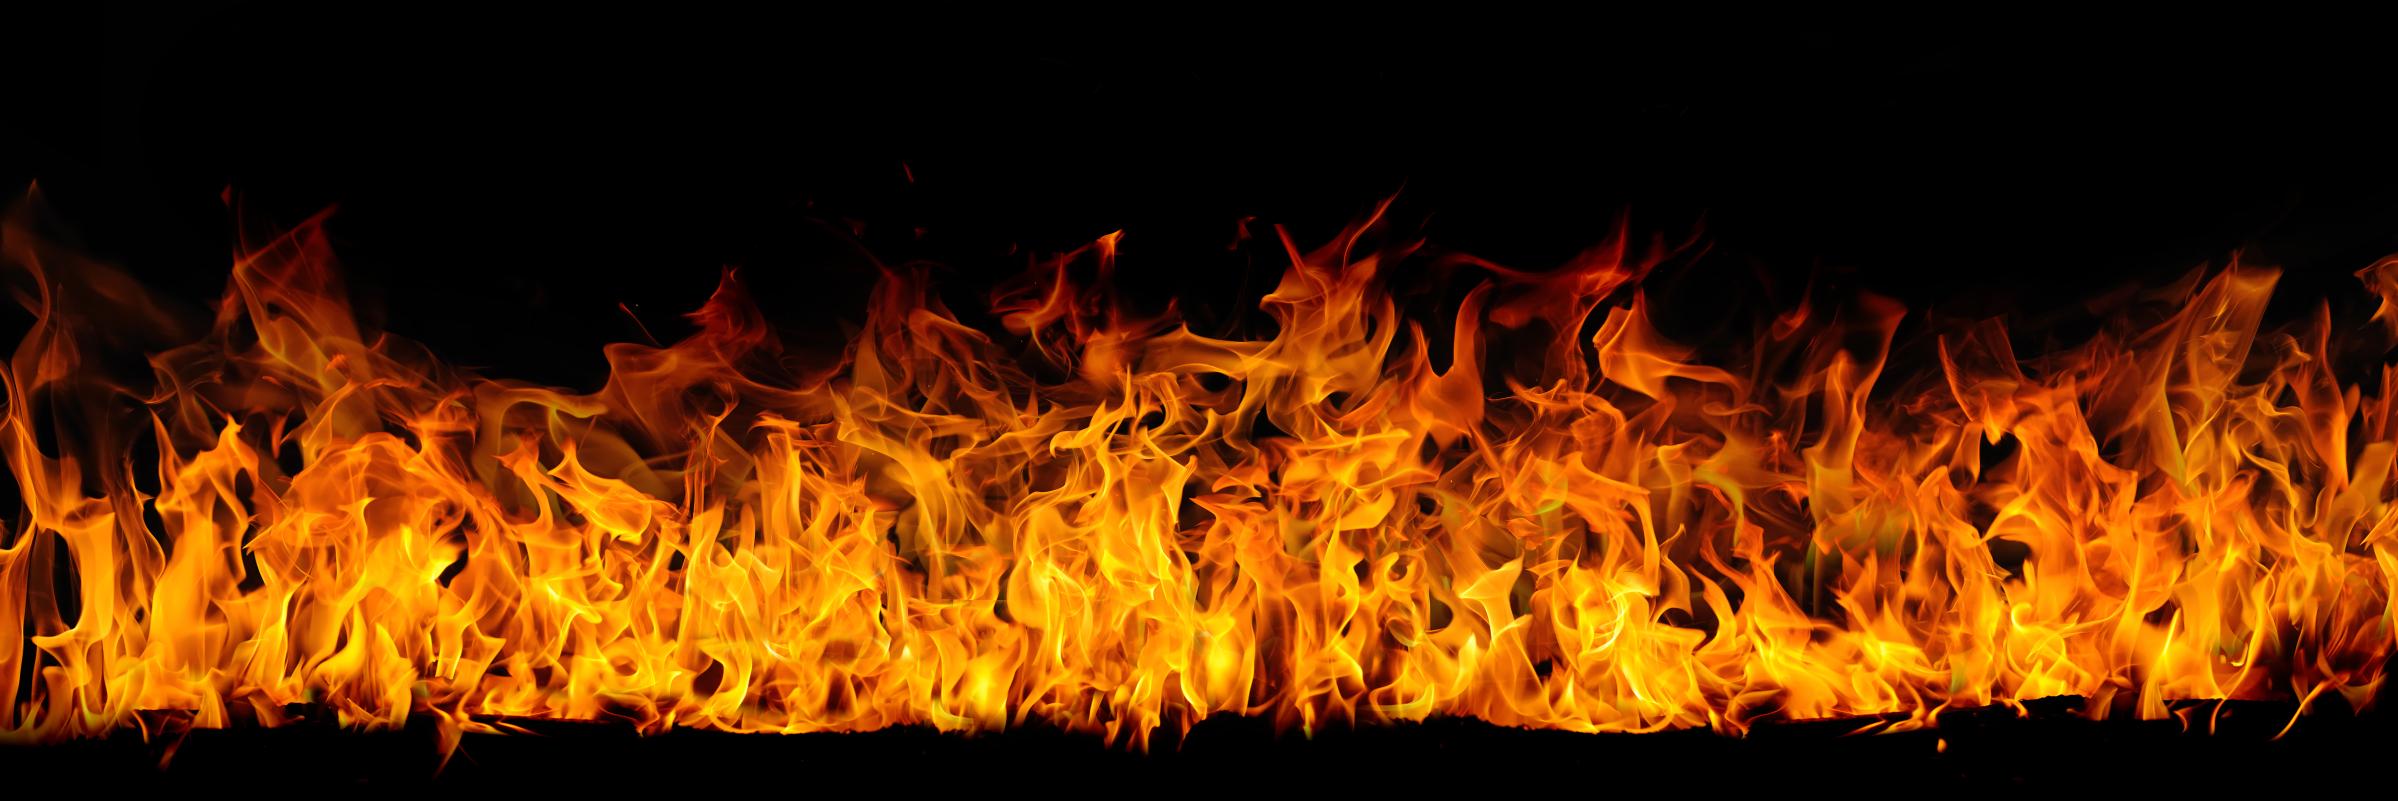 Isolated Flames - iStock_000015458755_Medium